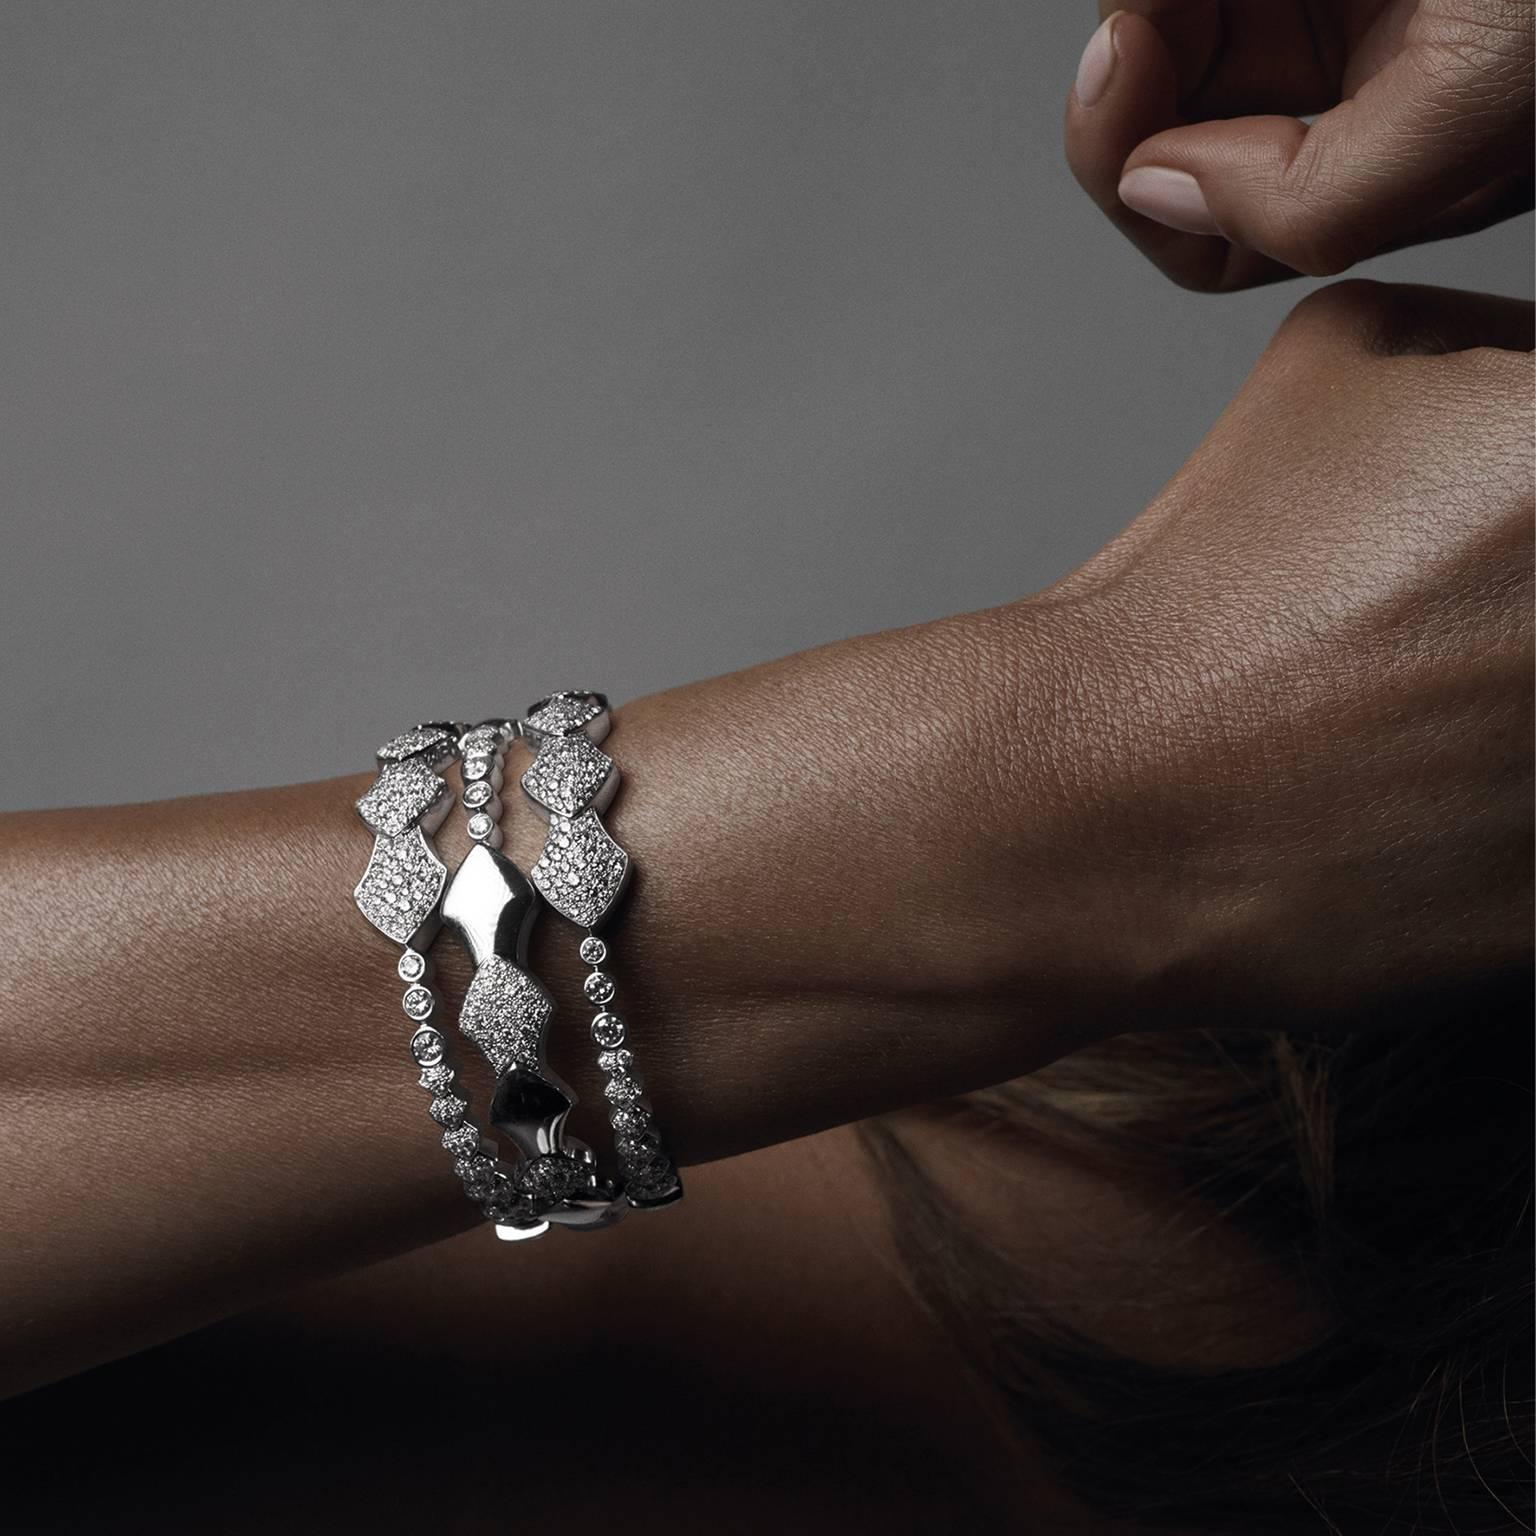 Akillis 18kt White Gold Half Diamond Set Python Bracelet 4eASYGh3C